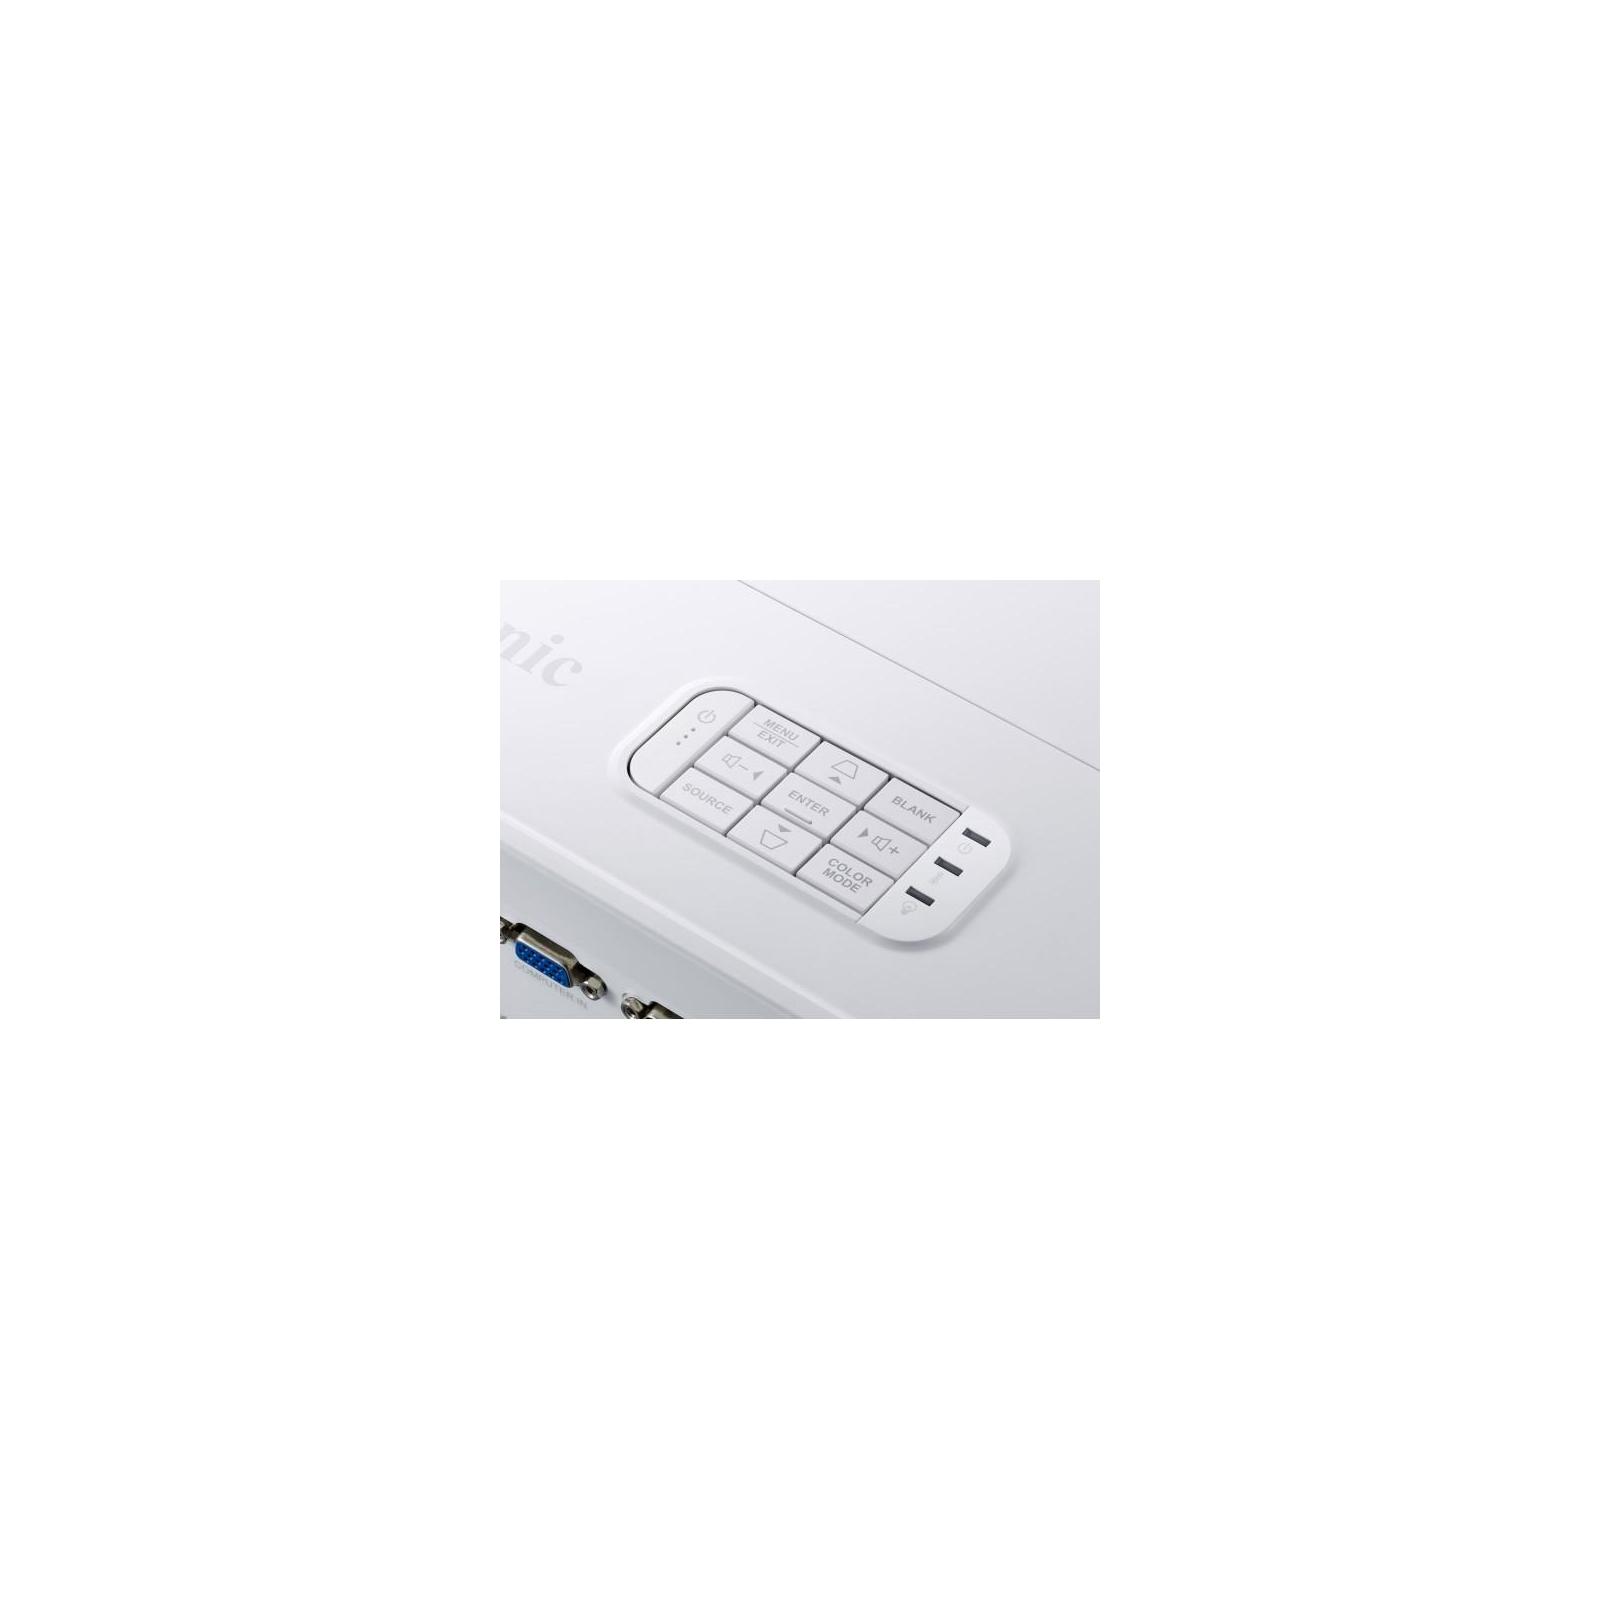 Проектор Viewsonic PS501W (VS17261) изображение 6